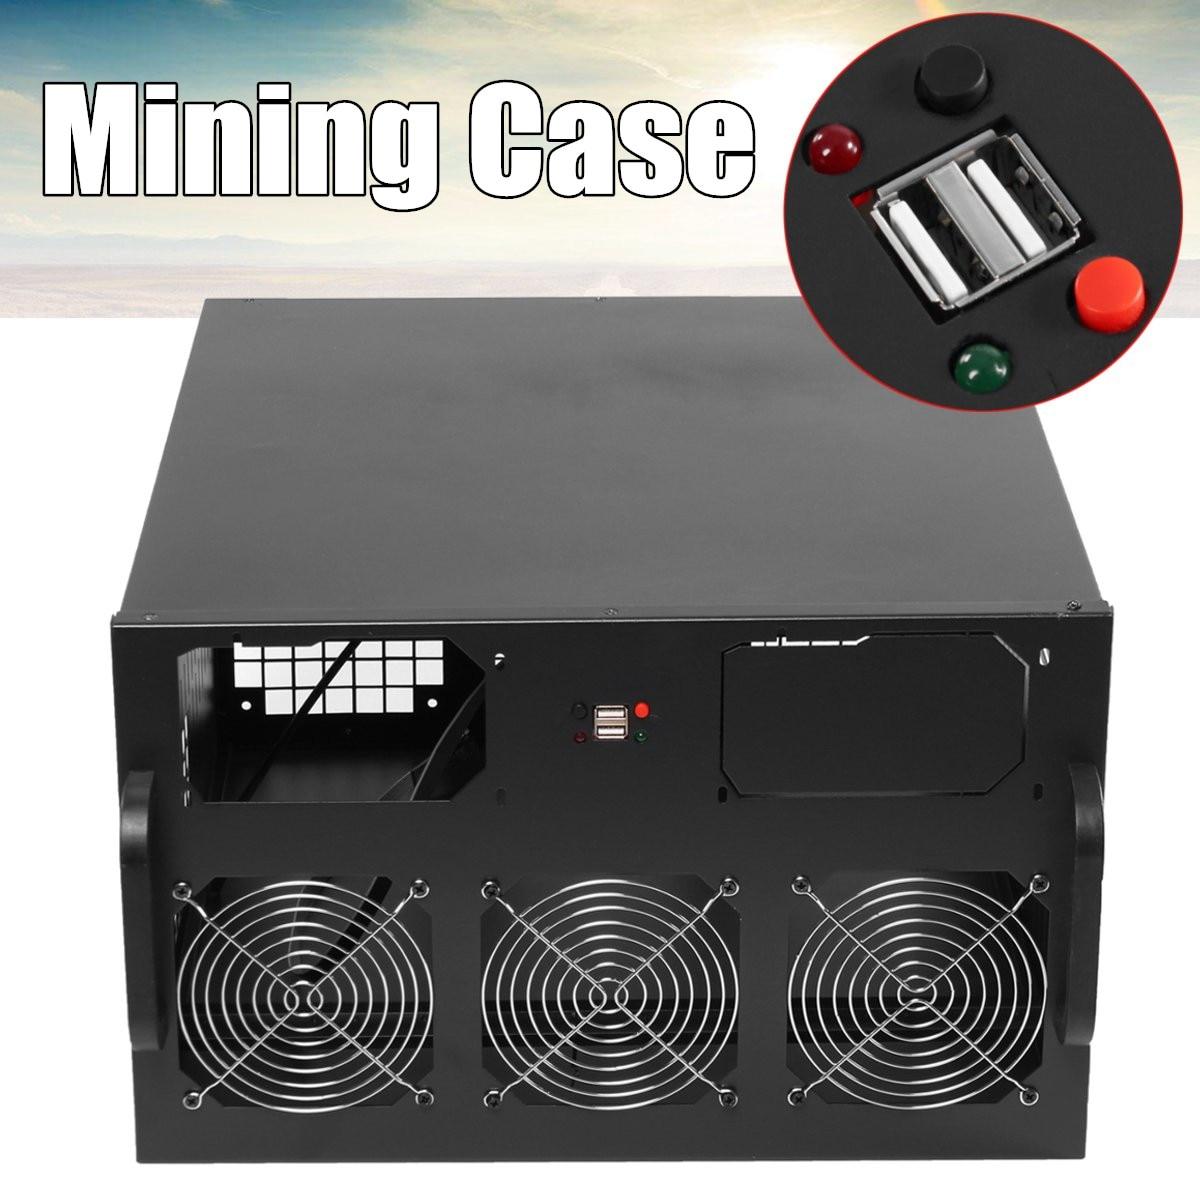 Open Air Coin Mining Miner Frame Rig Case 6U 2x USB 2.0 3 Fans ETH BTC Ethereum